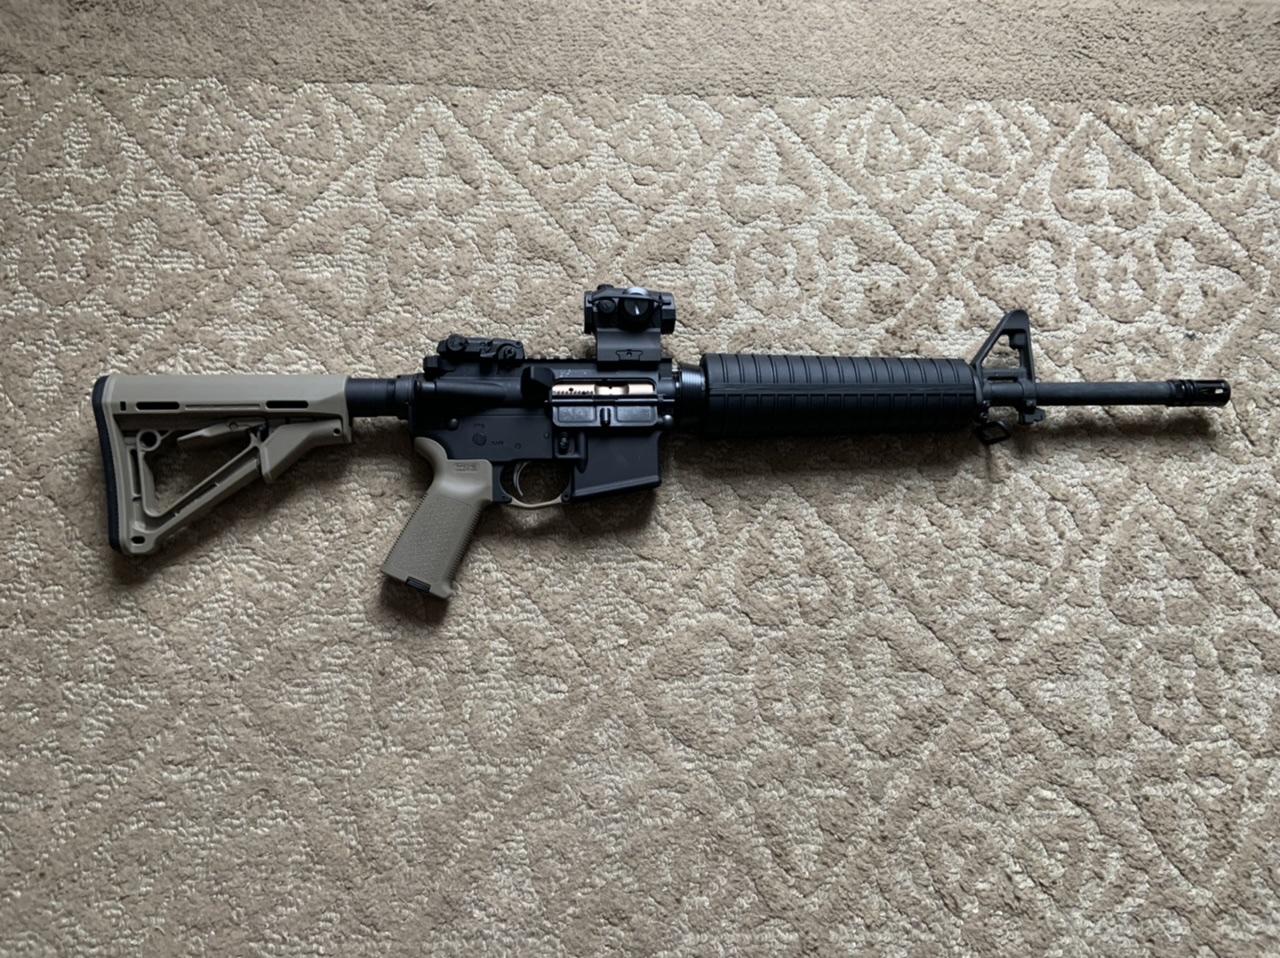 Rifle Picture Thread-d68729ab-17aa-40f1-8329-8f28932fbbe4_1580239511785.jpeg